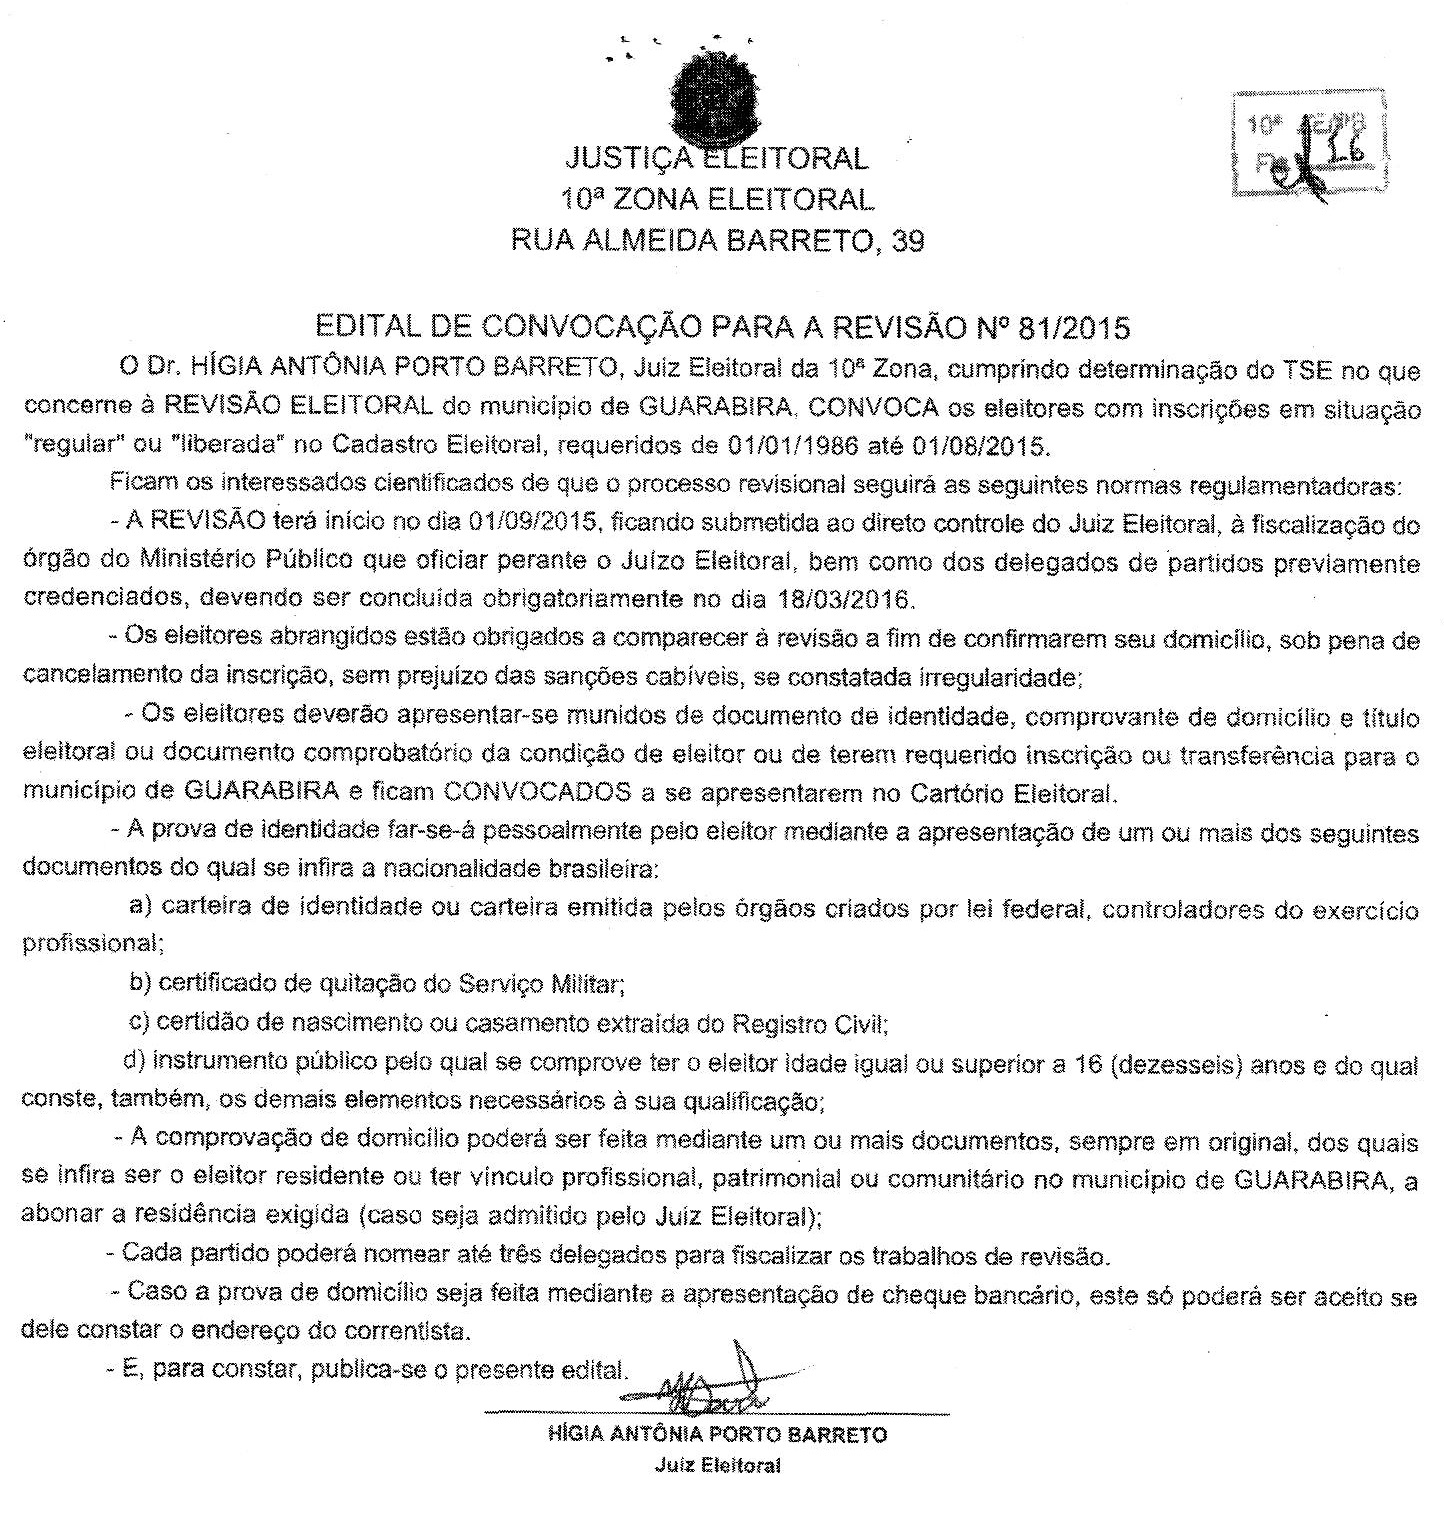 oficio_10zona_eleitoral_21.09.2015_Guarabira_ok